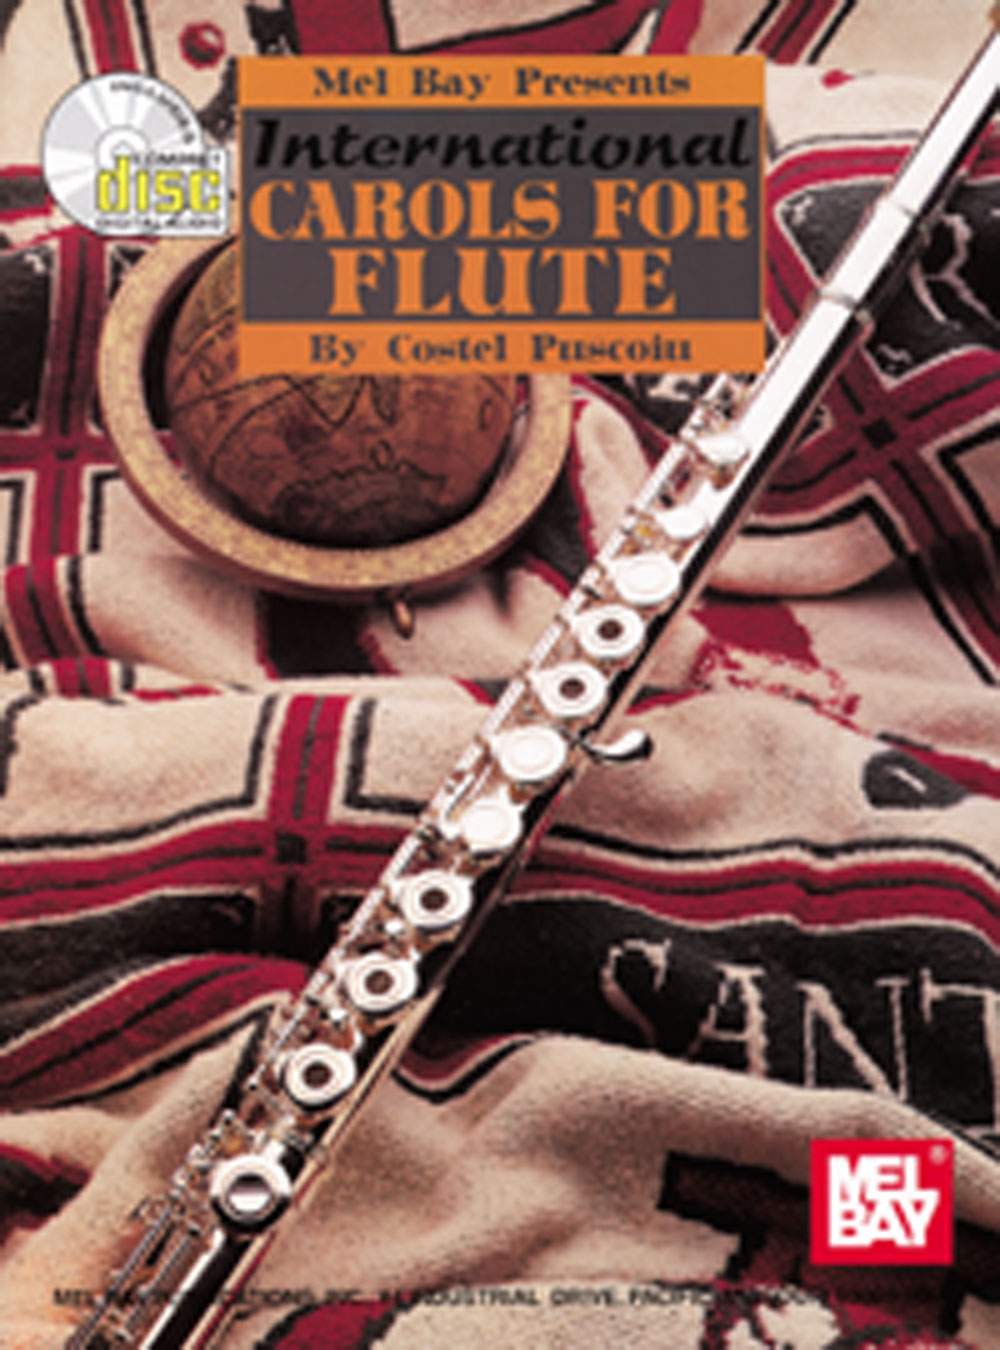 International Carols For Flute